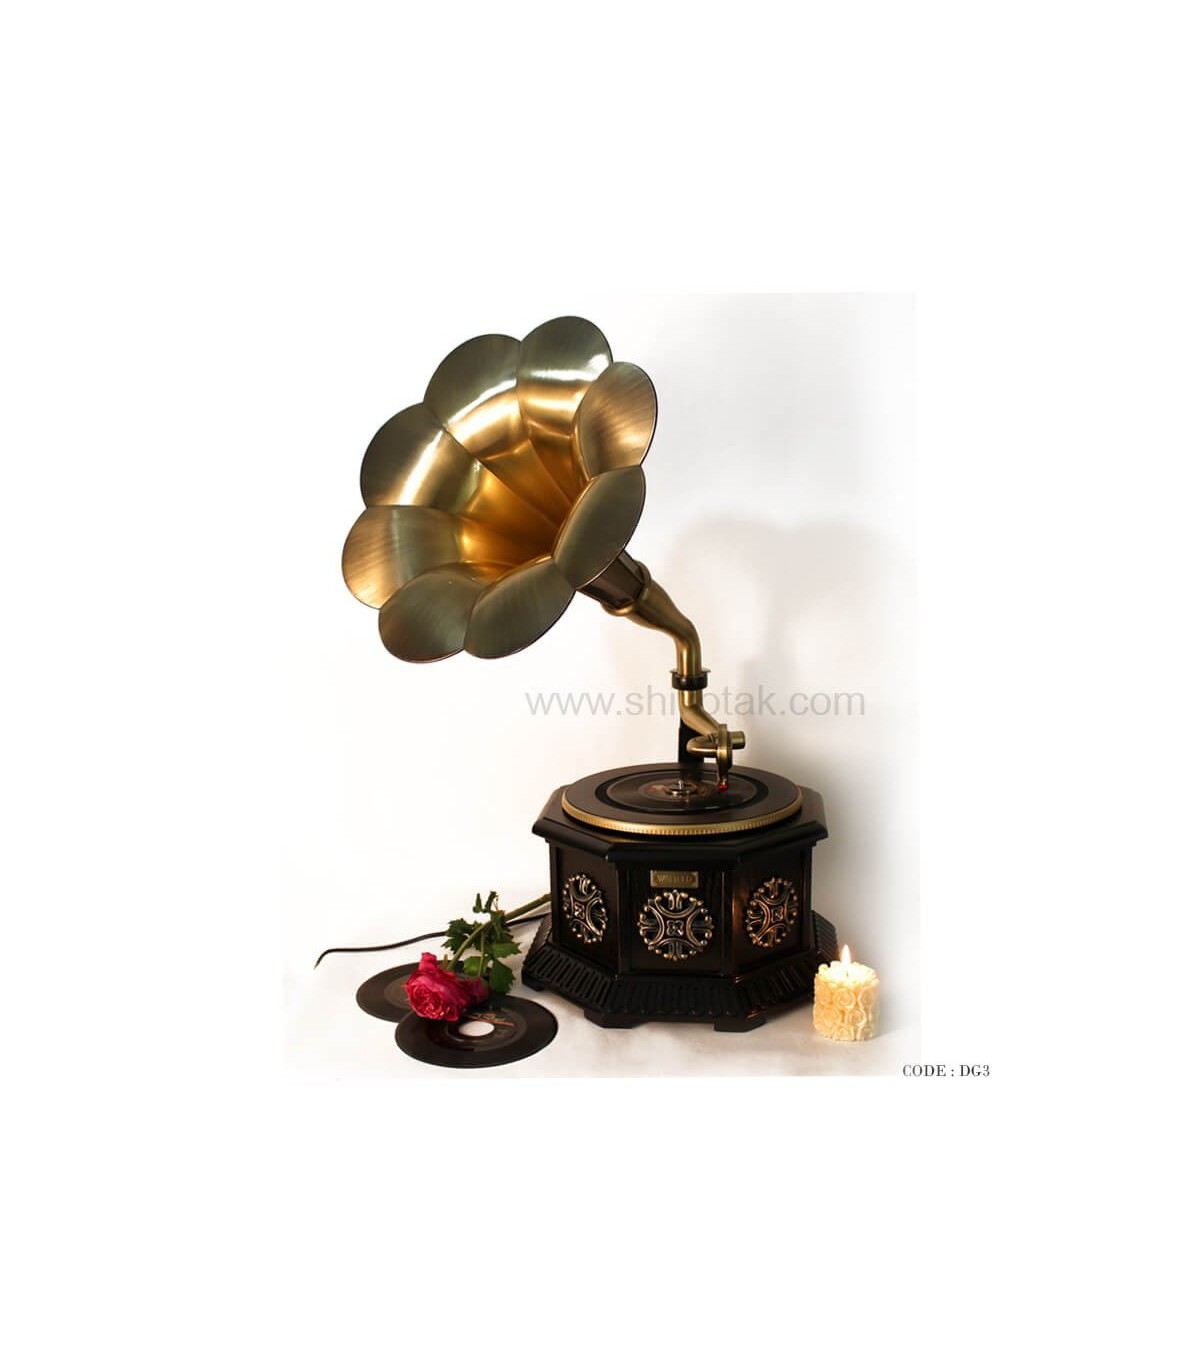 گرامافون رومیزی فلش خور سری 062